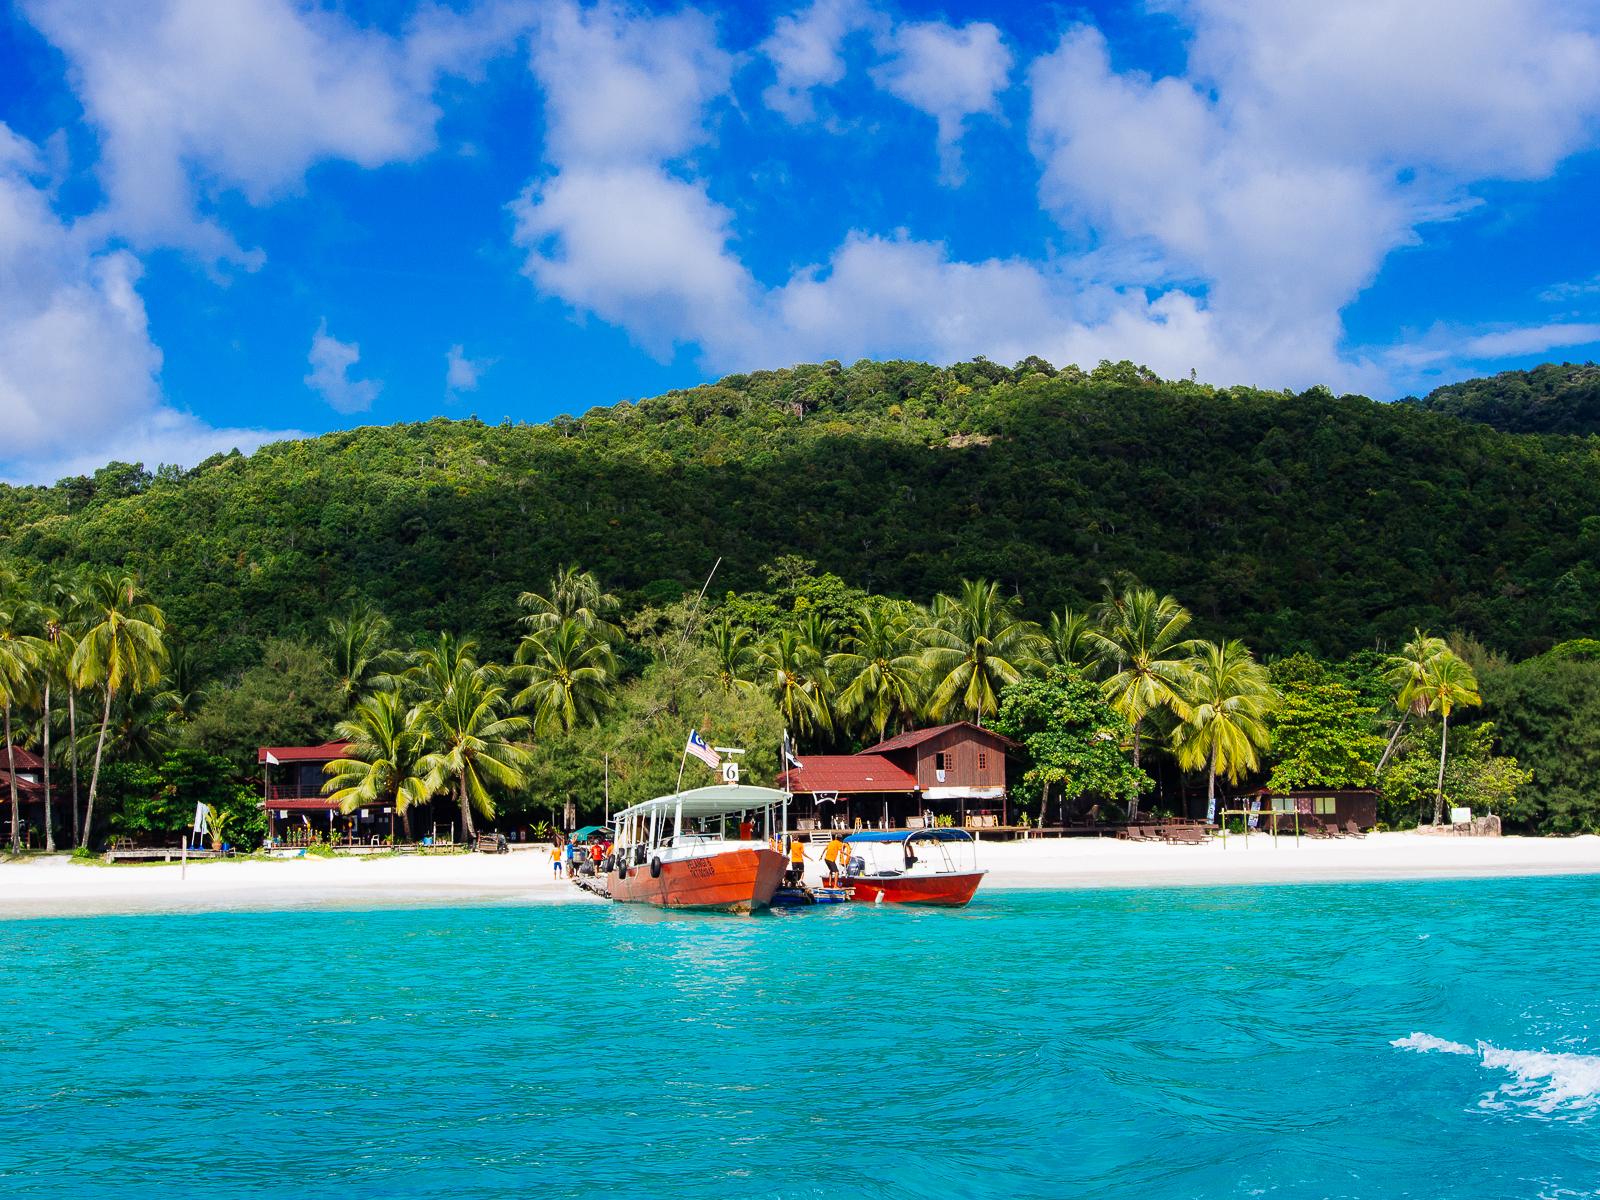 Ocean Blue Sea Sun Beach Boats Island Paradise Turquoise Tropical Noon Tropicalparadise Pulauredang